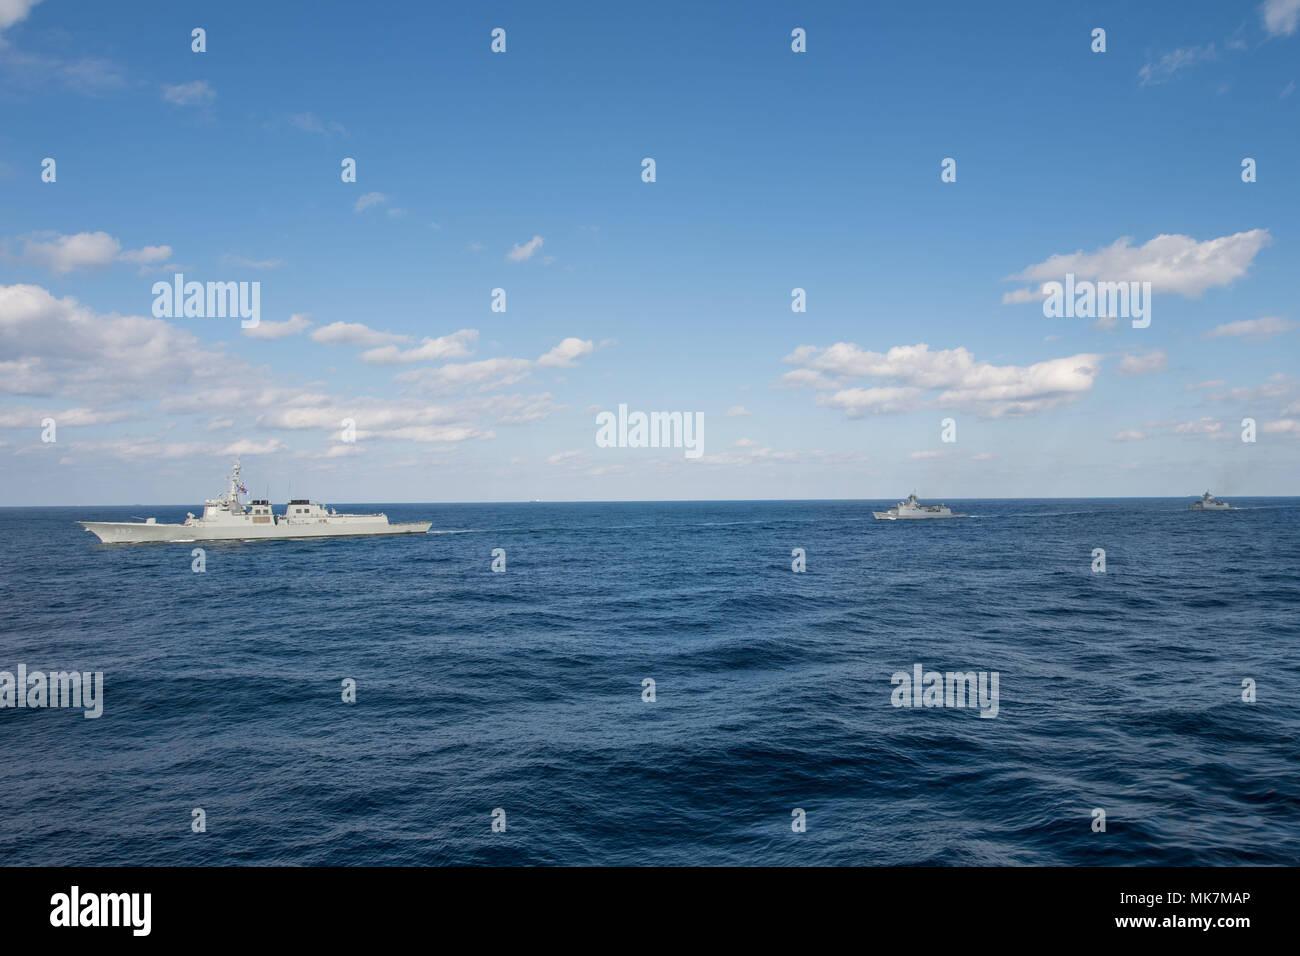 Three Carrier Strike Force Stock Photos & Three Carrier Strike Force ...